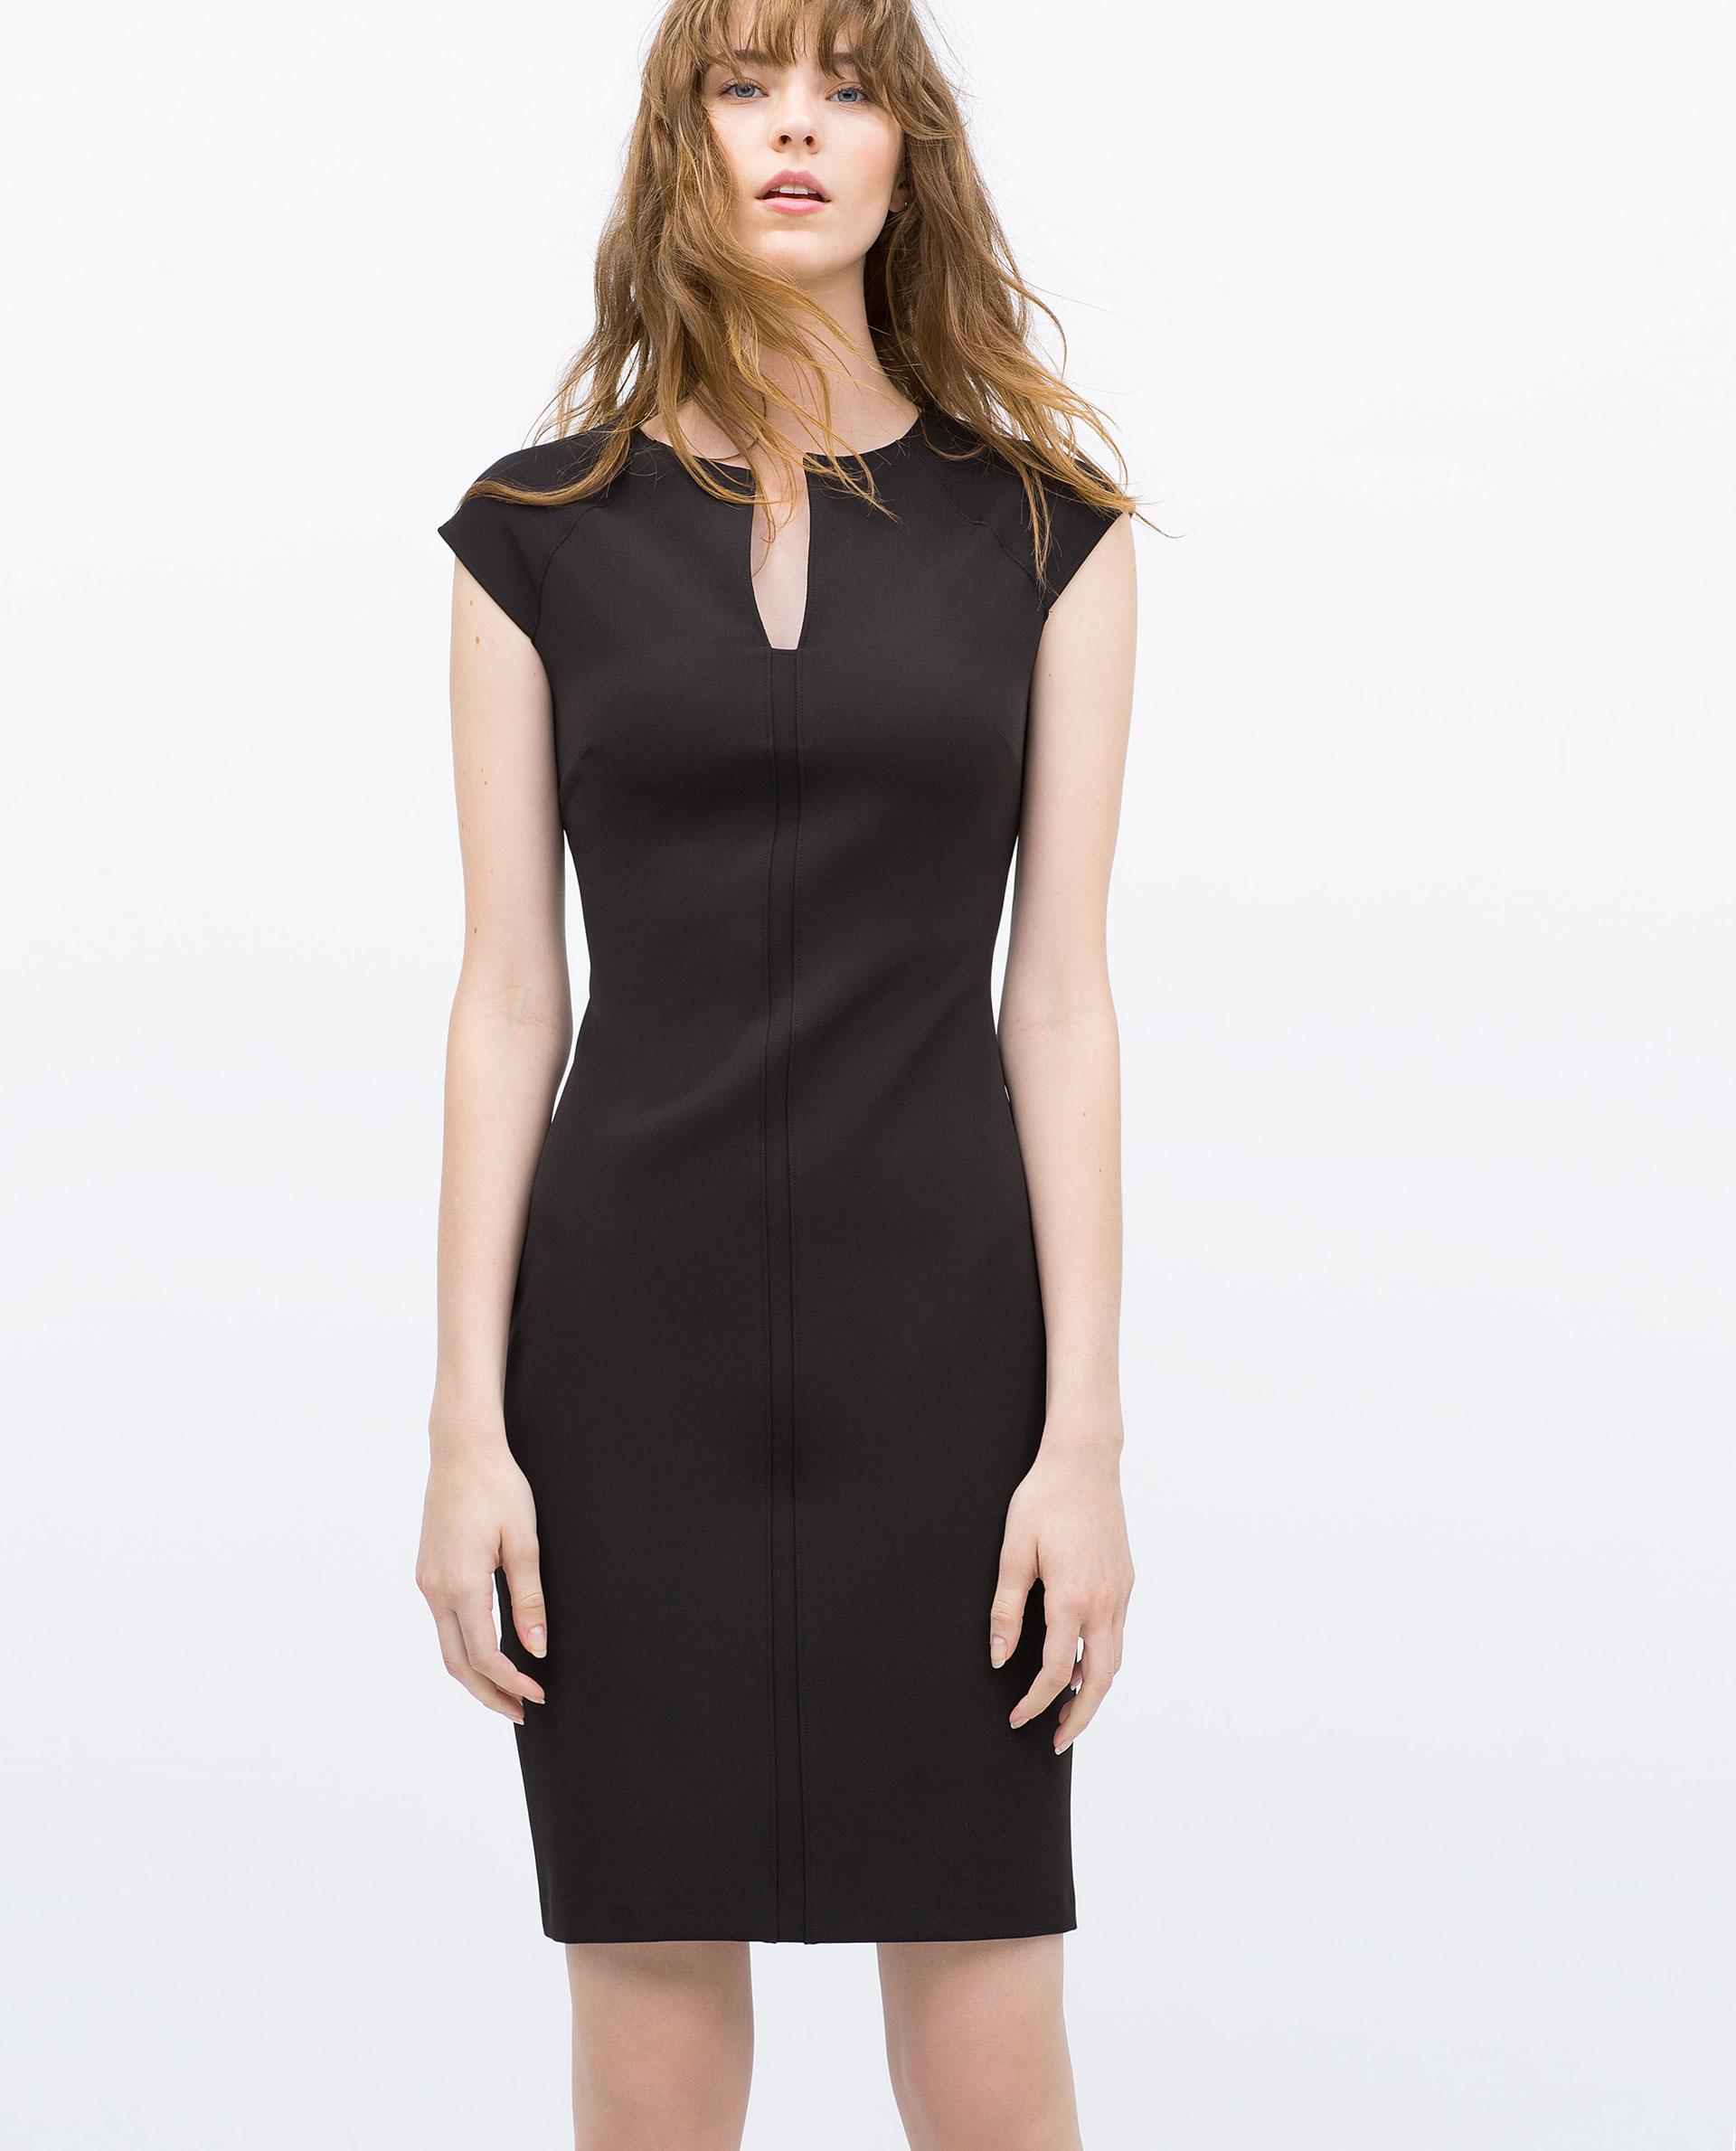 Zara Tube Dress With Raglan Sleeves in Black   Lyst - photo#44